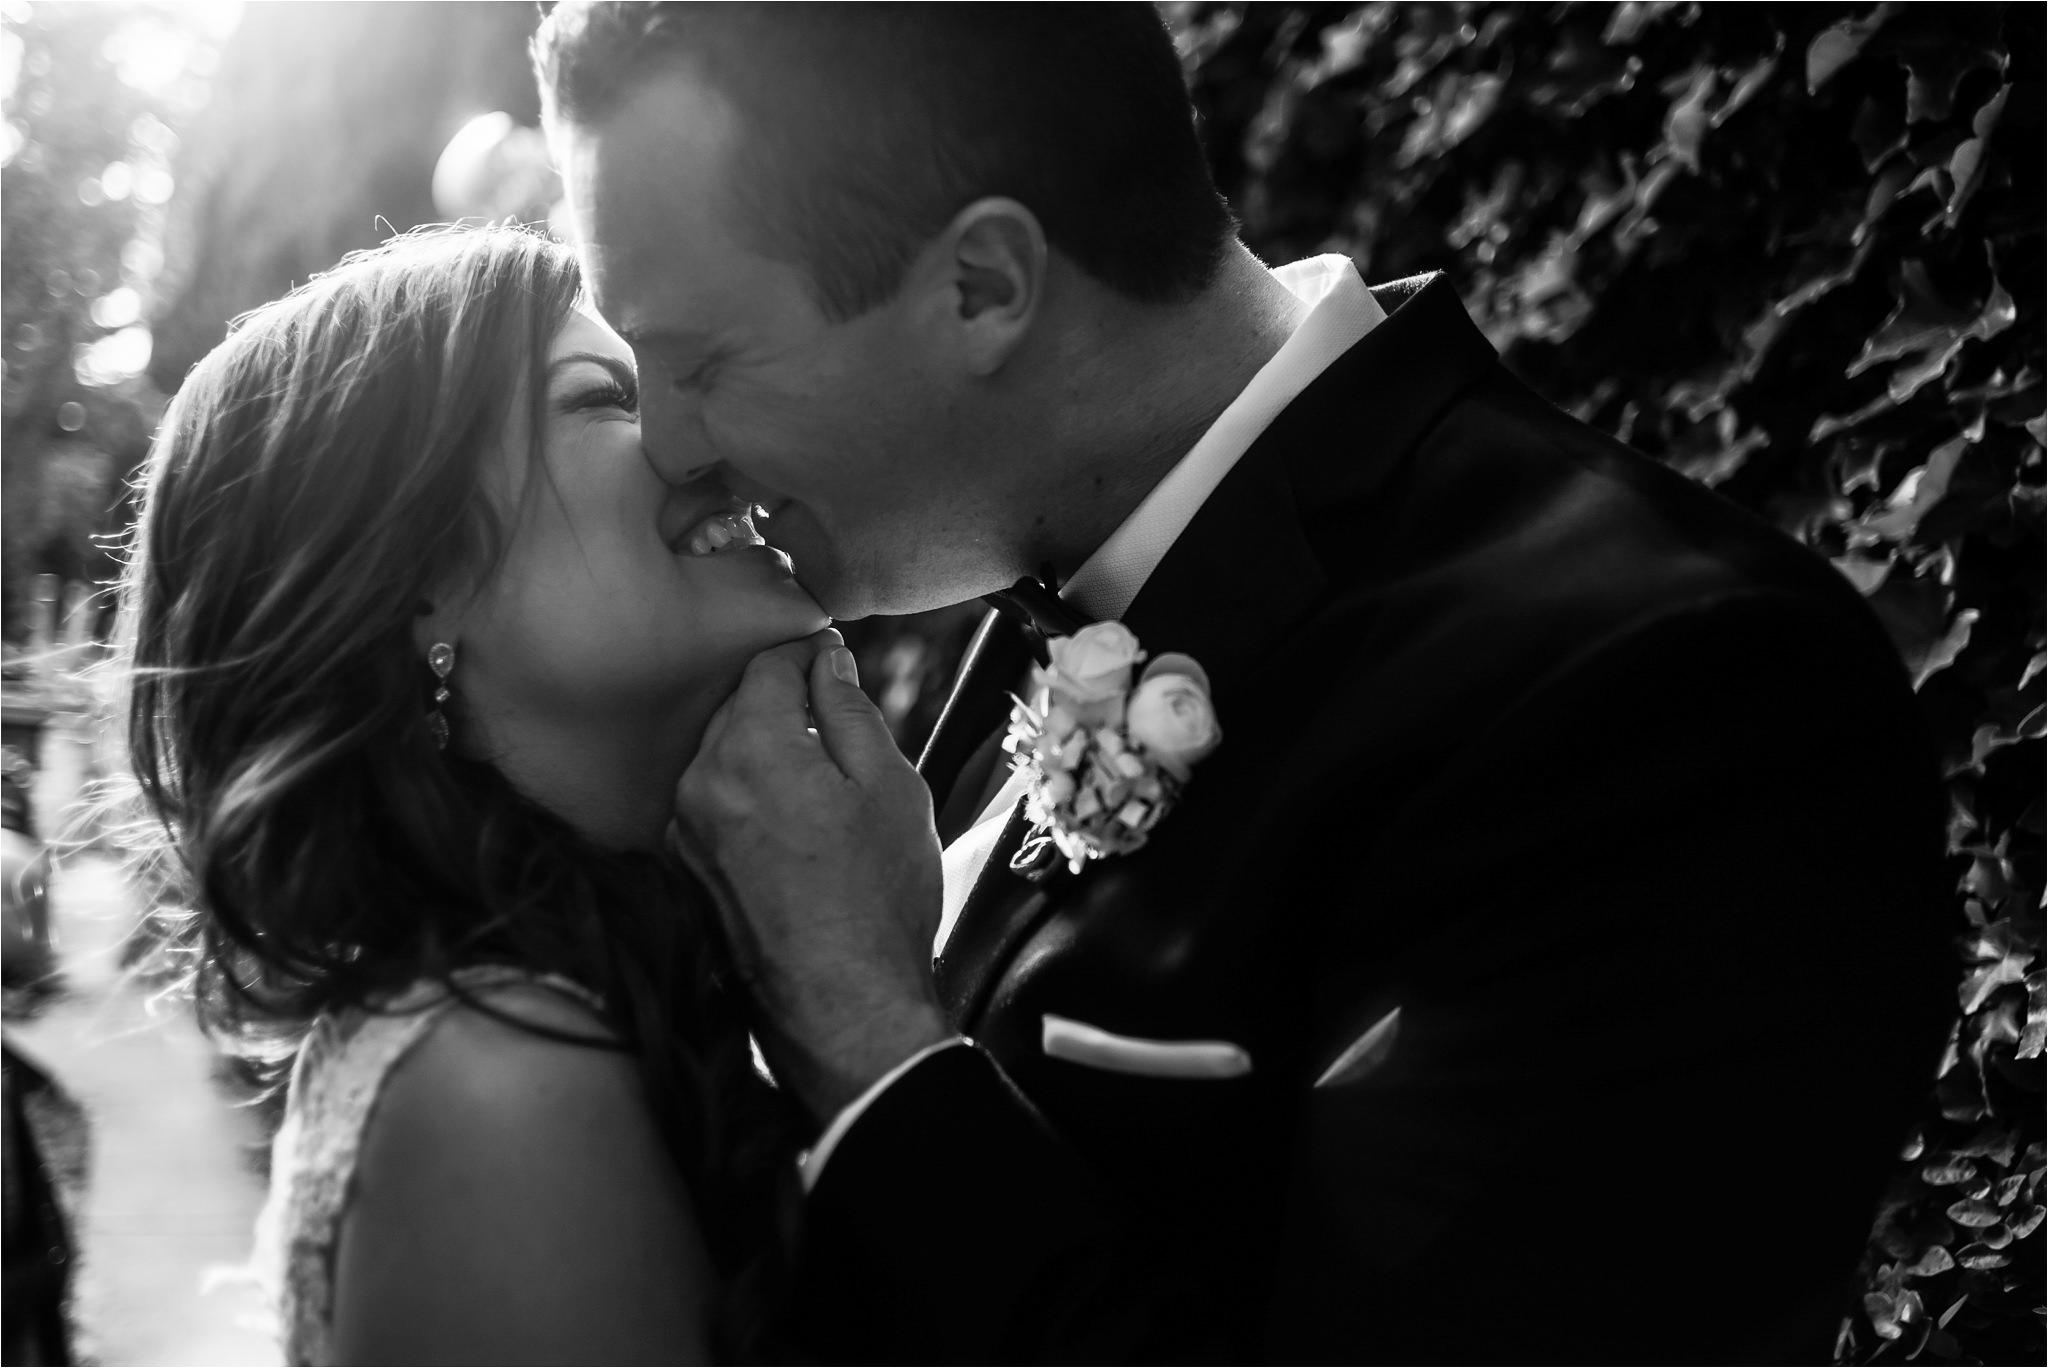 jessica-roman-photography-arden hills wedding photograpger-sacramento-boise-31.jpg